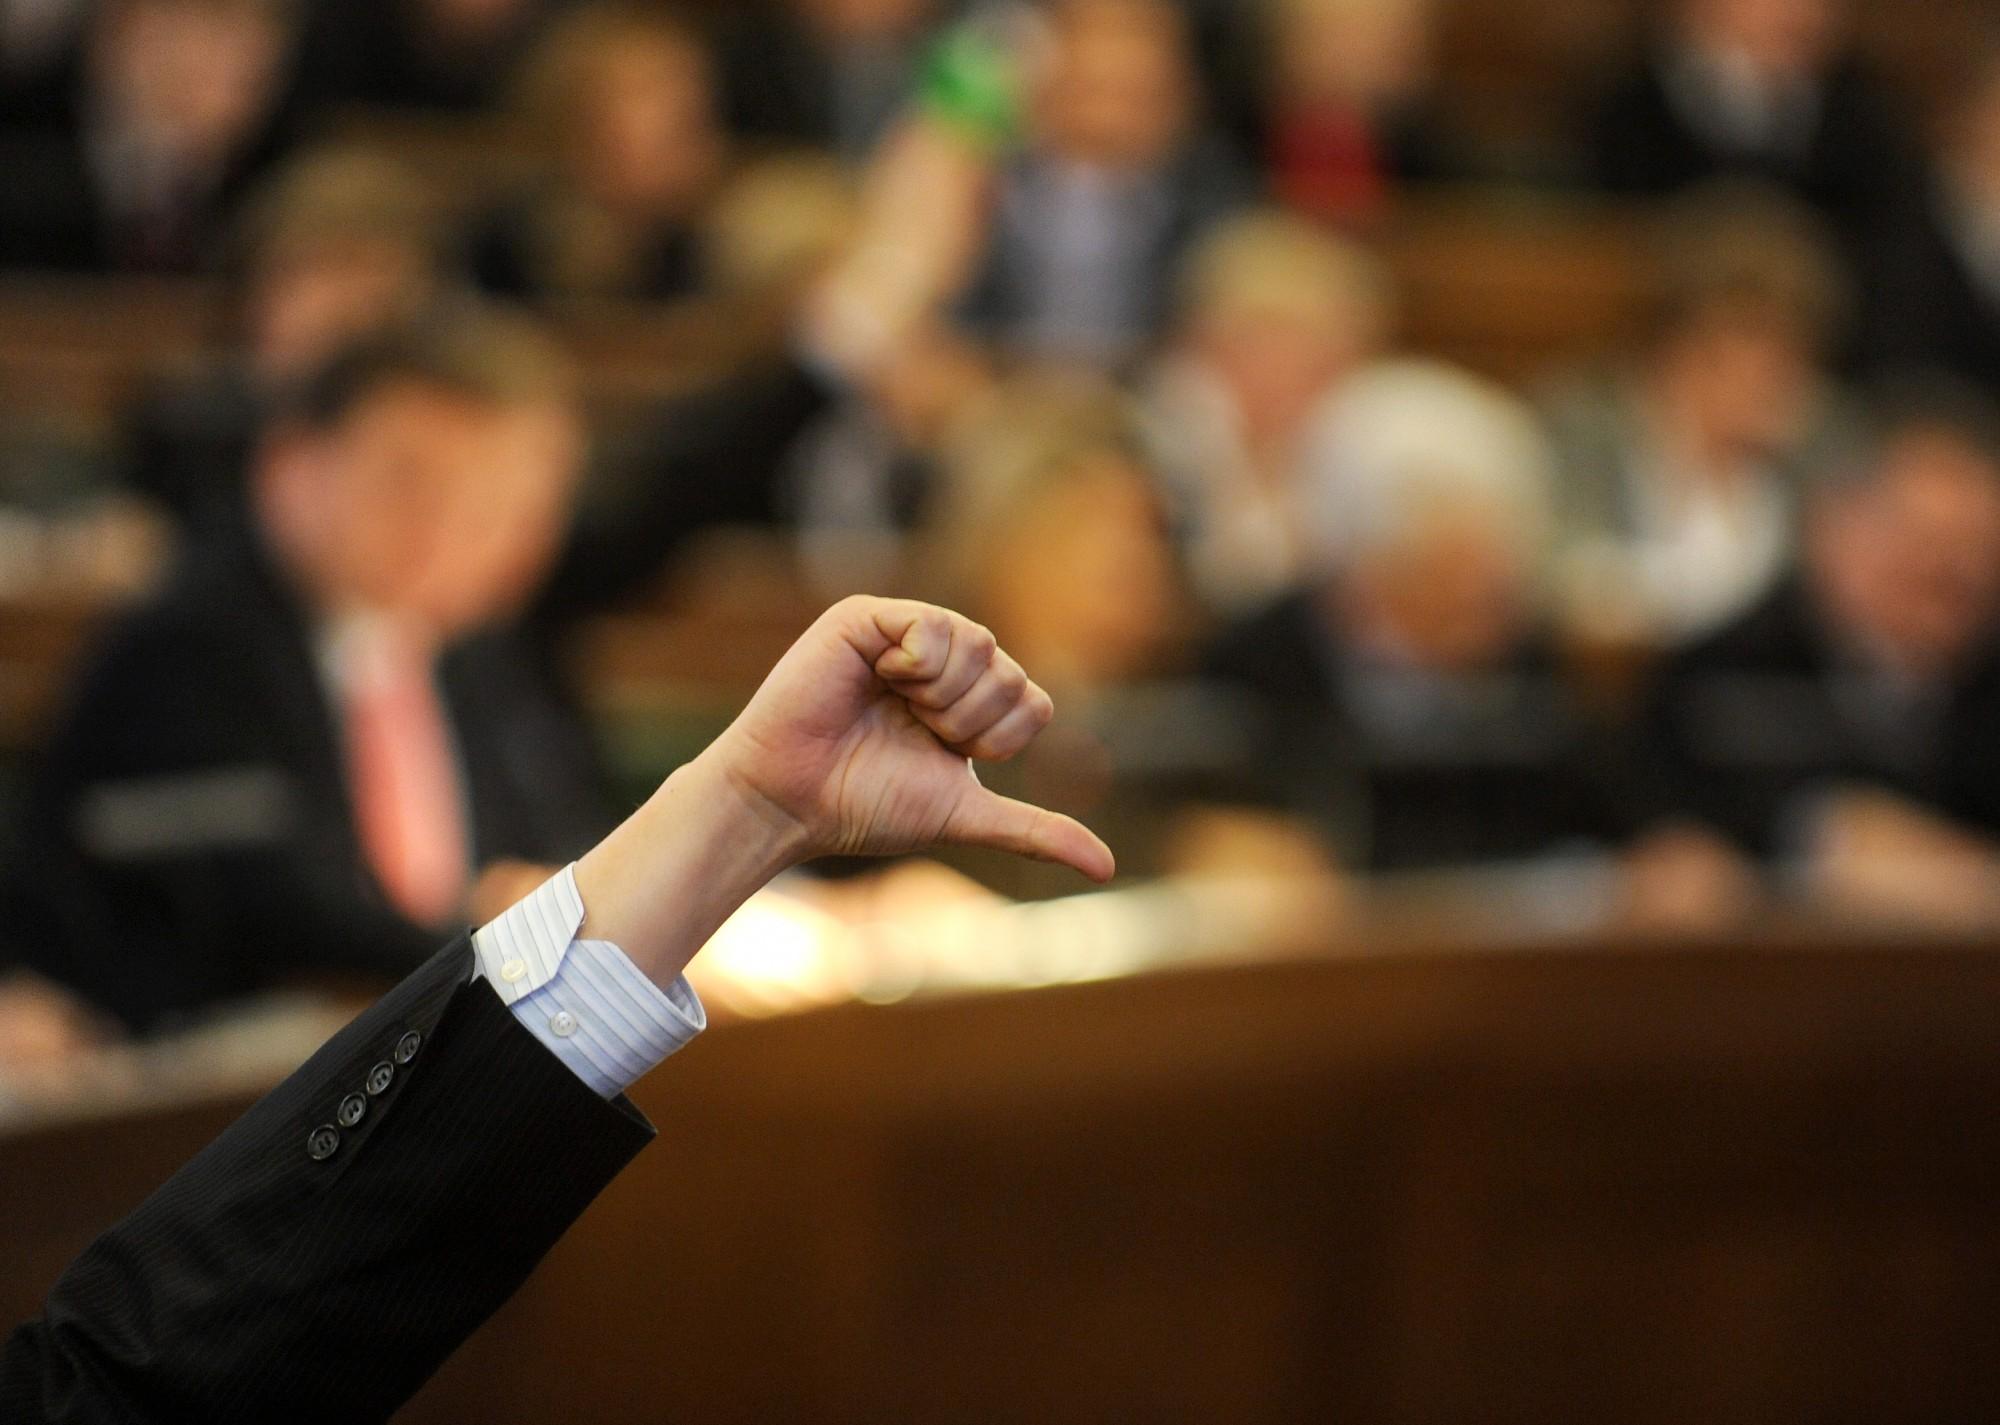 Правительство отклонило все предложения оппозиции по проекту бюджета на 2020 год